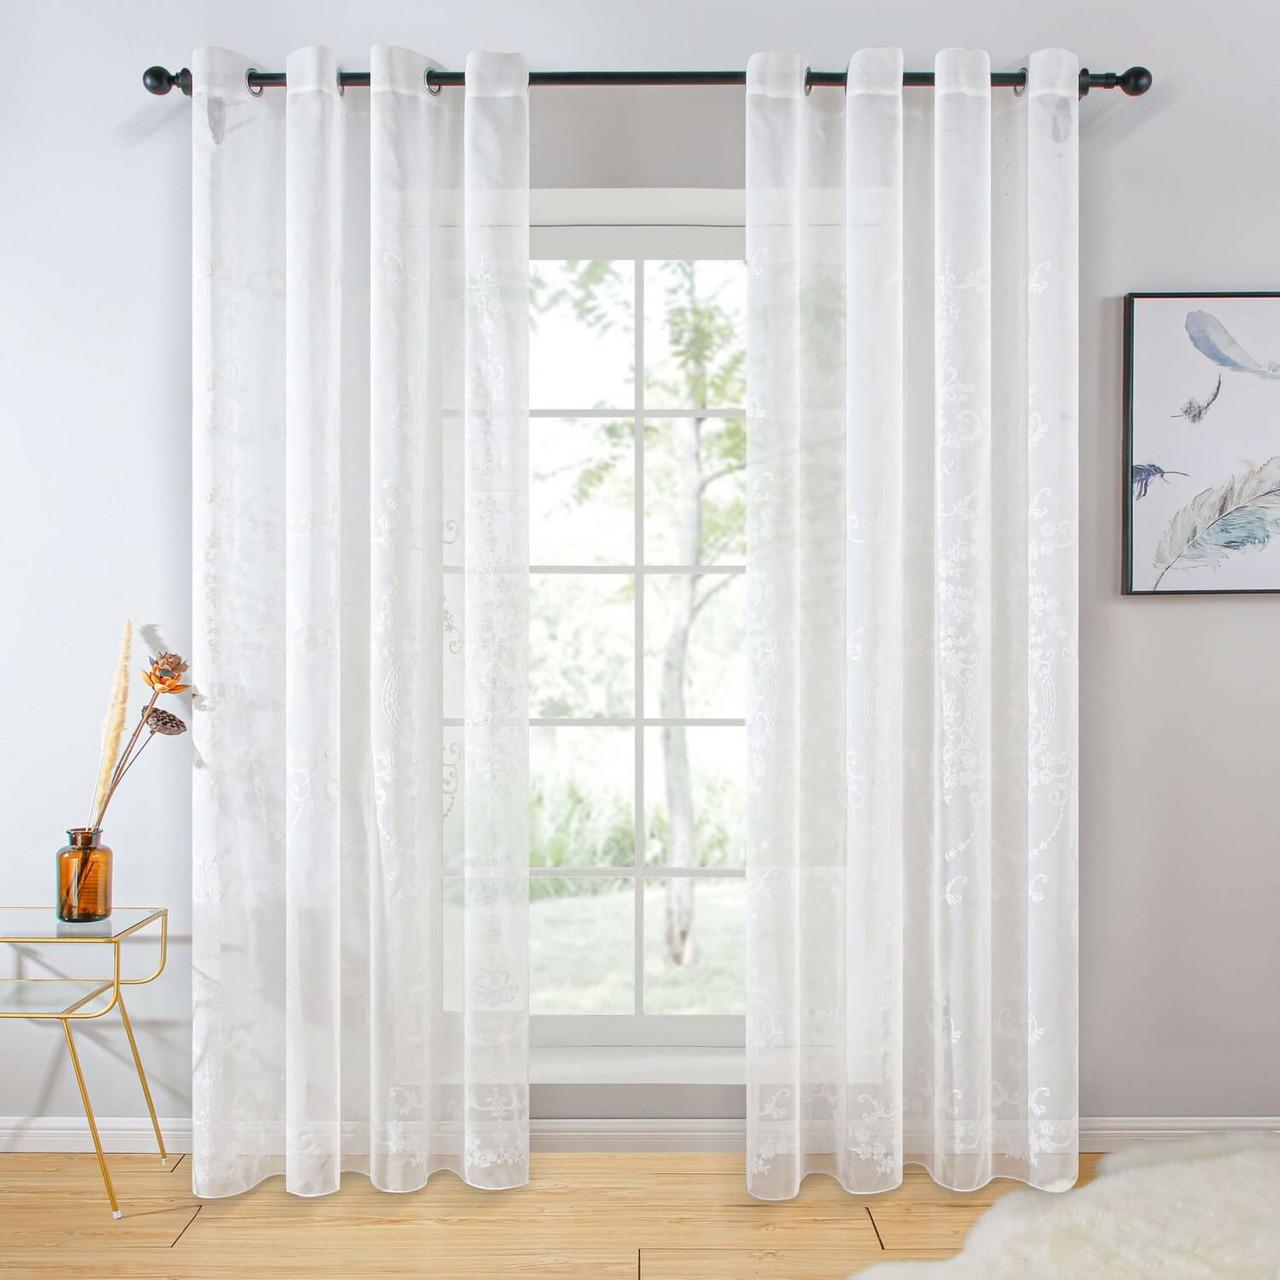 Sheer Curtain Panel Grommet-Top Window Treatments DMC722 Dolce Mela 8171460151464